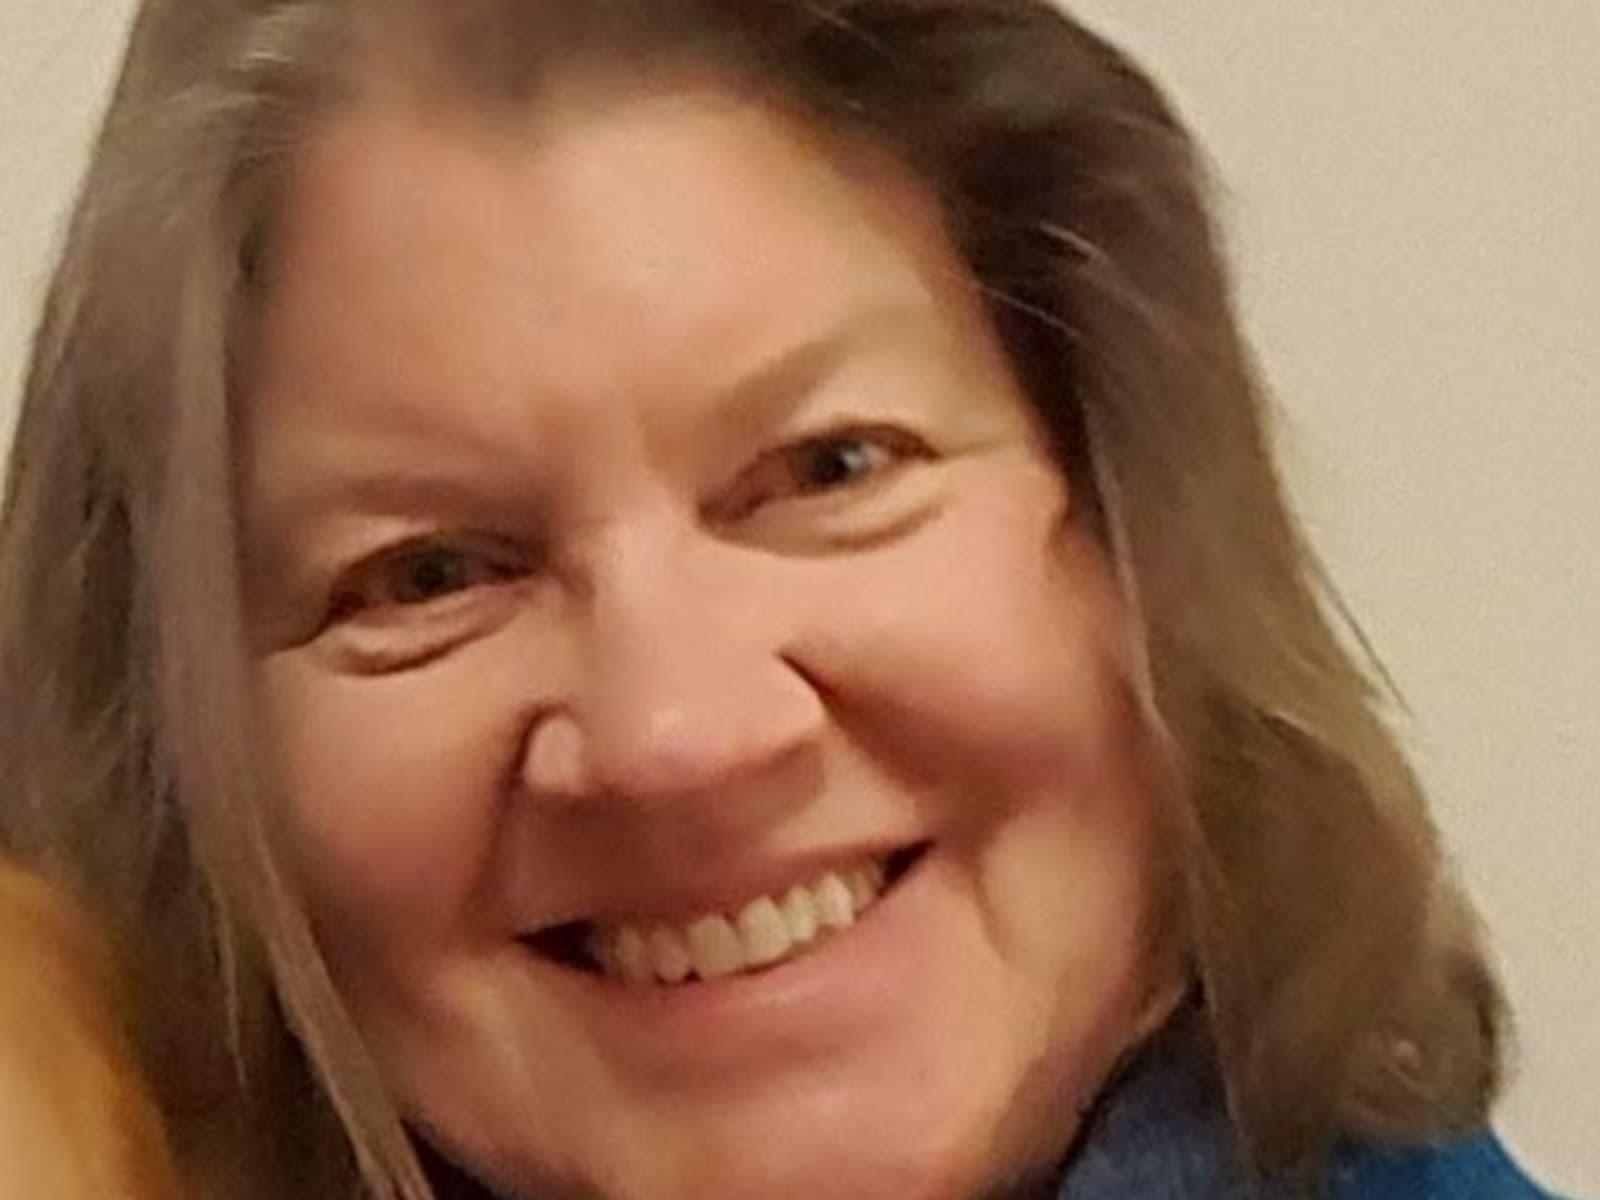 Barbara from Fairbanks, Alaska, United States